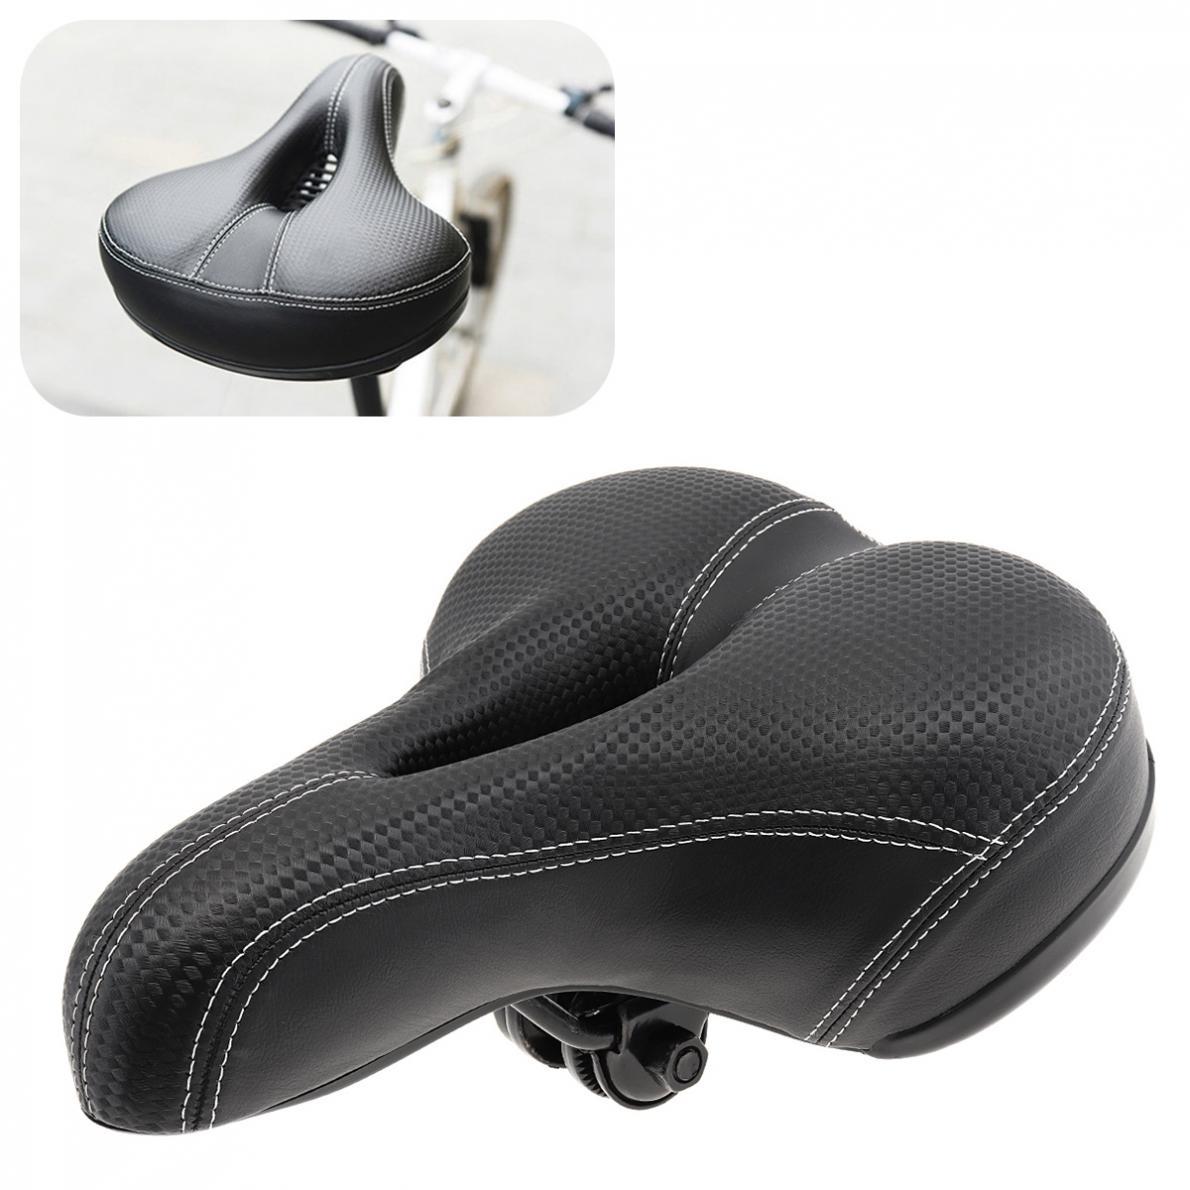 Wide Bicycle Seat Thicken Bike Saddle Bicicleta Seat Cycling Saddle MTB Cushion Asiento Bicicleta Sponge Soft Cycling Saddle